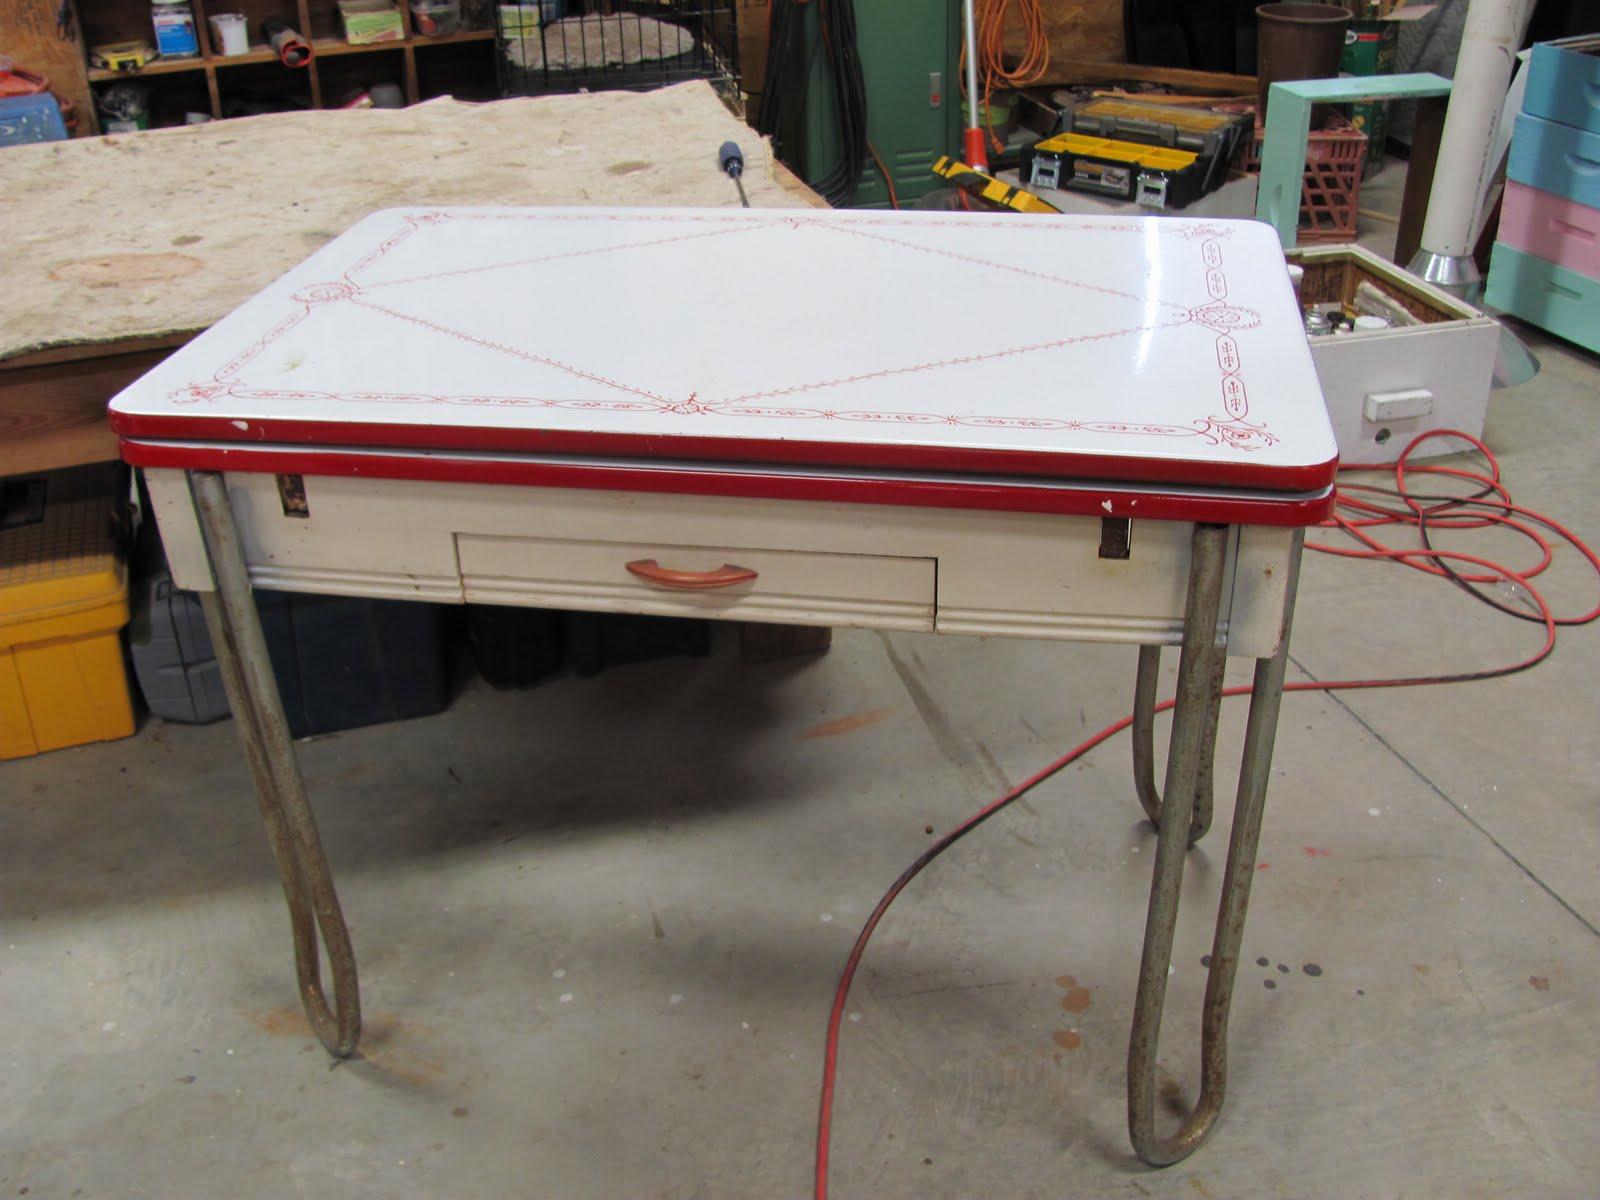 Thomas Nelson Furniture Restoration: Antique Retro Enamel ...